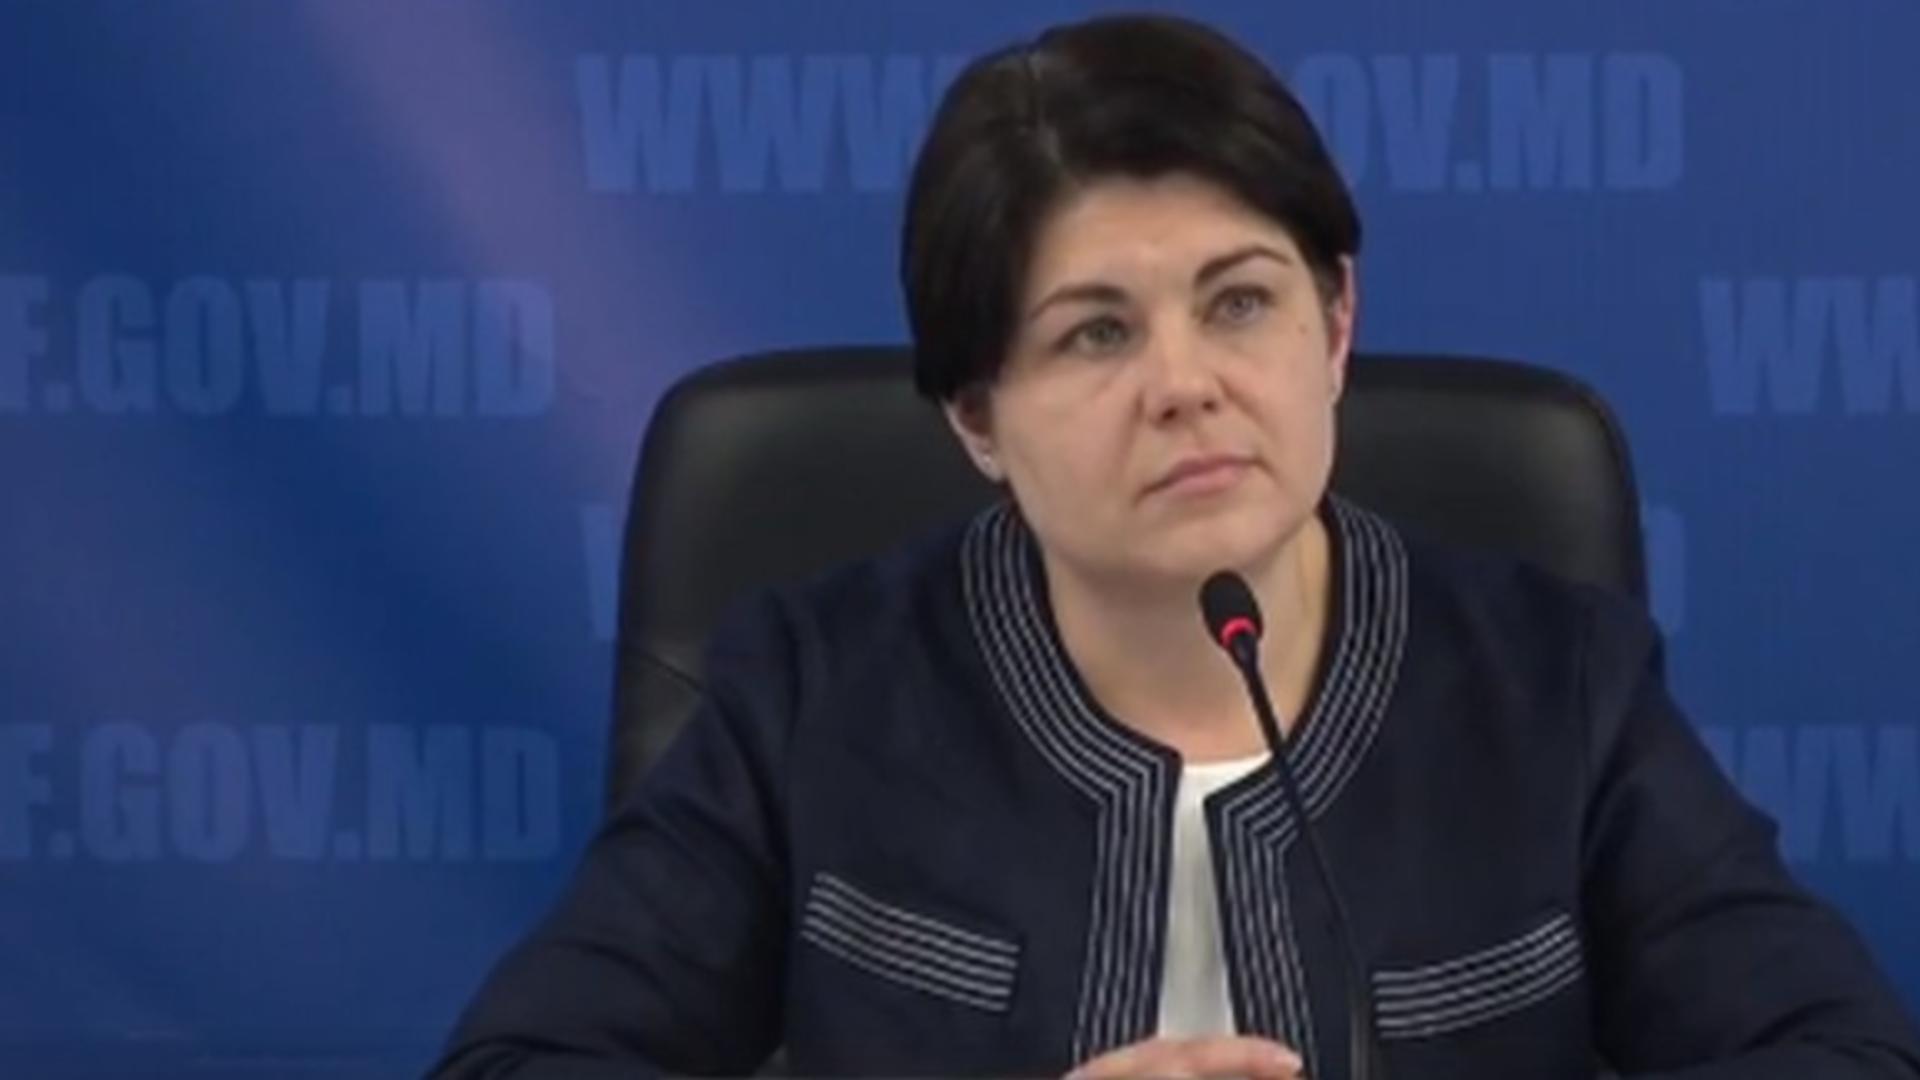 Natalia Gavrilița, premierul Republicii Moldova, desemnat de Maia Sandu